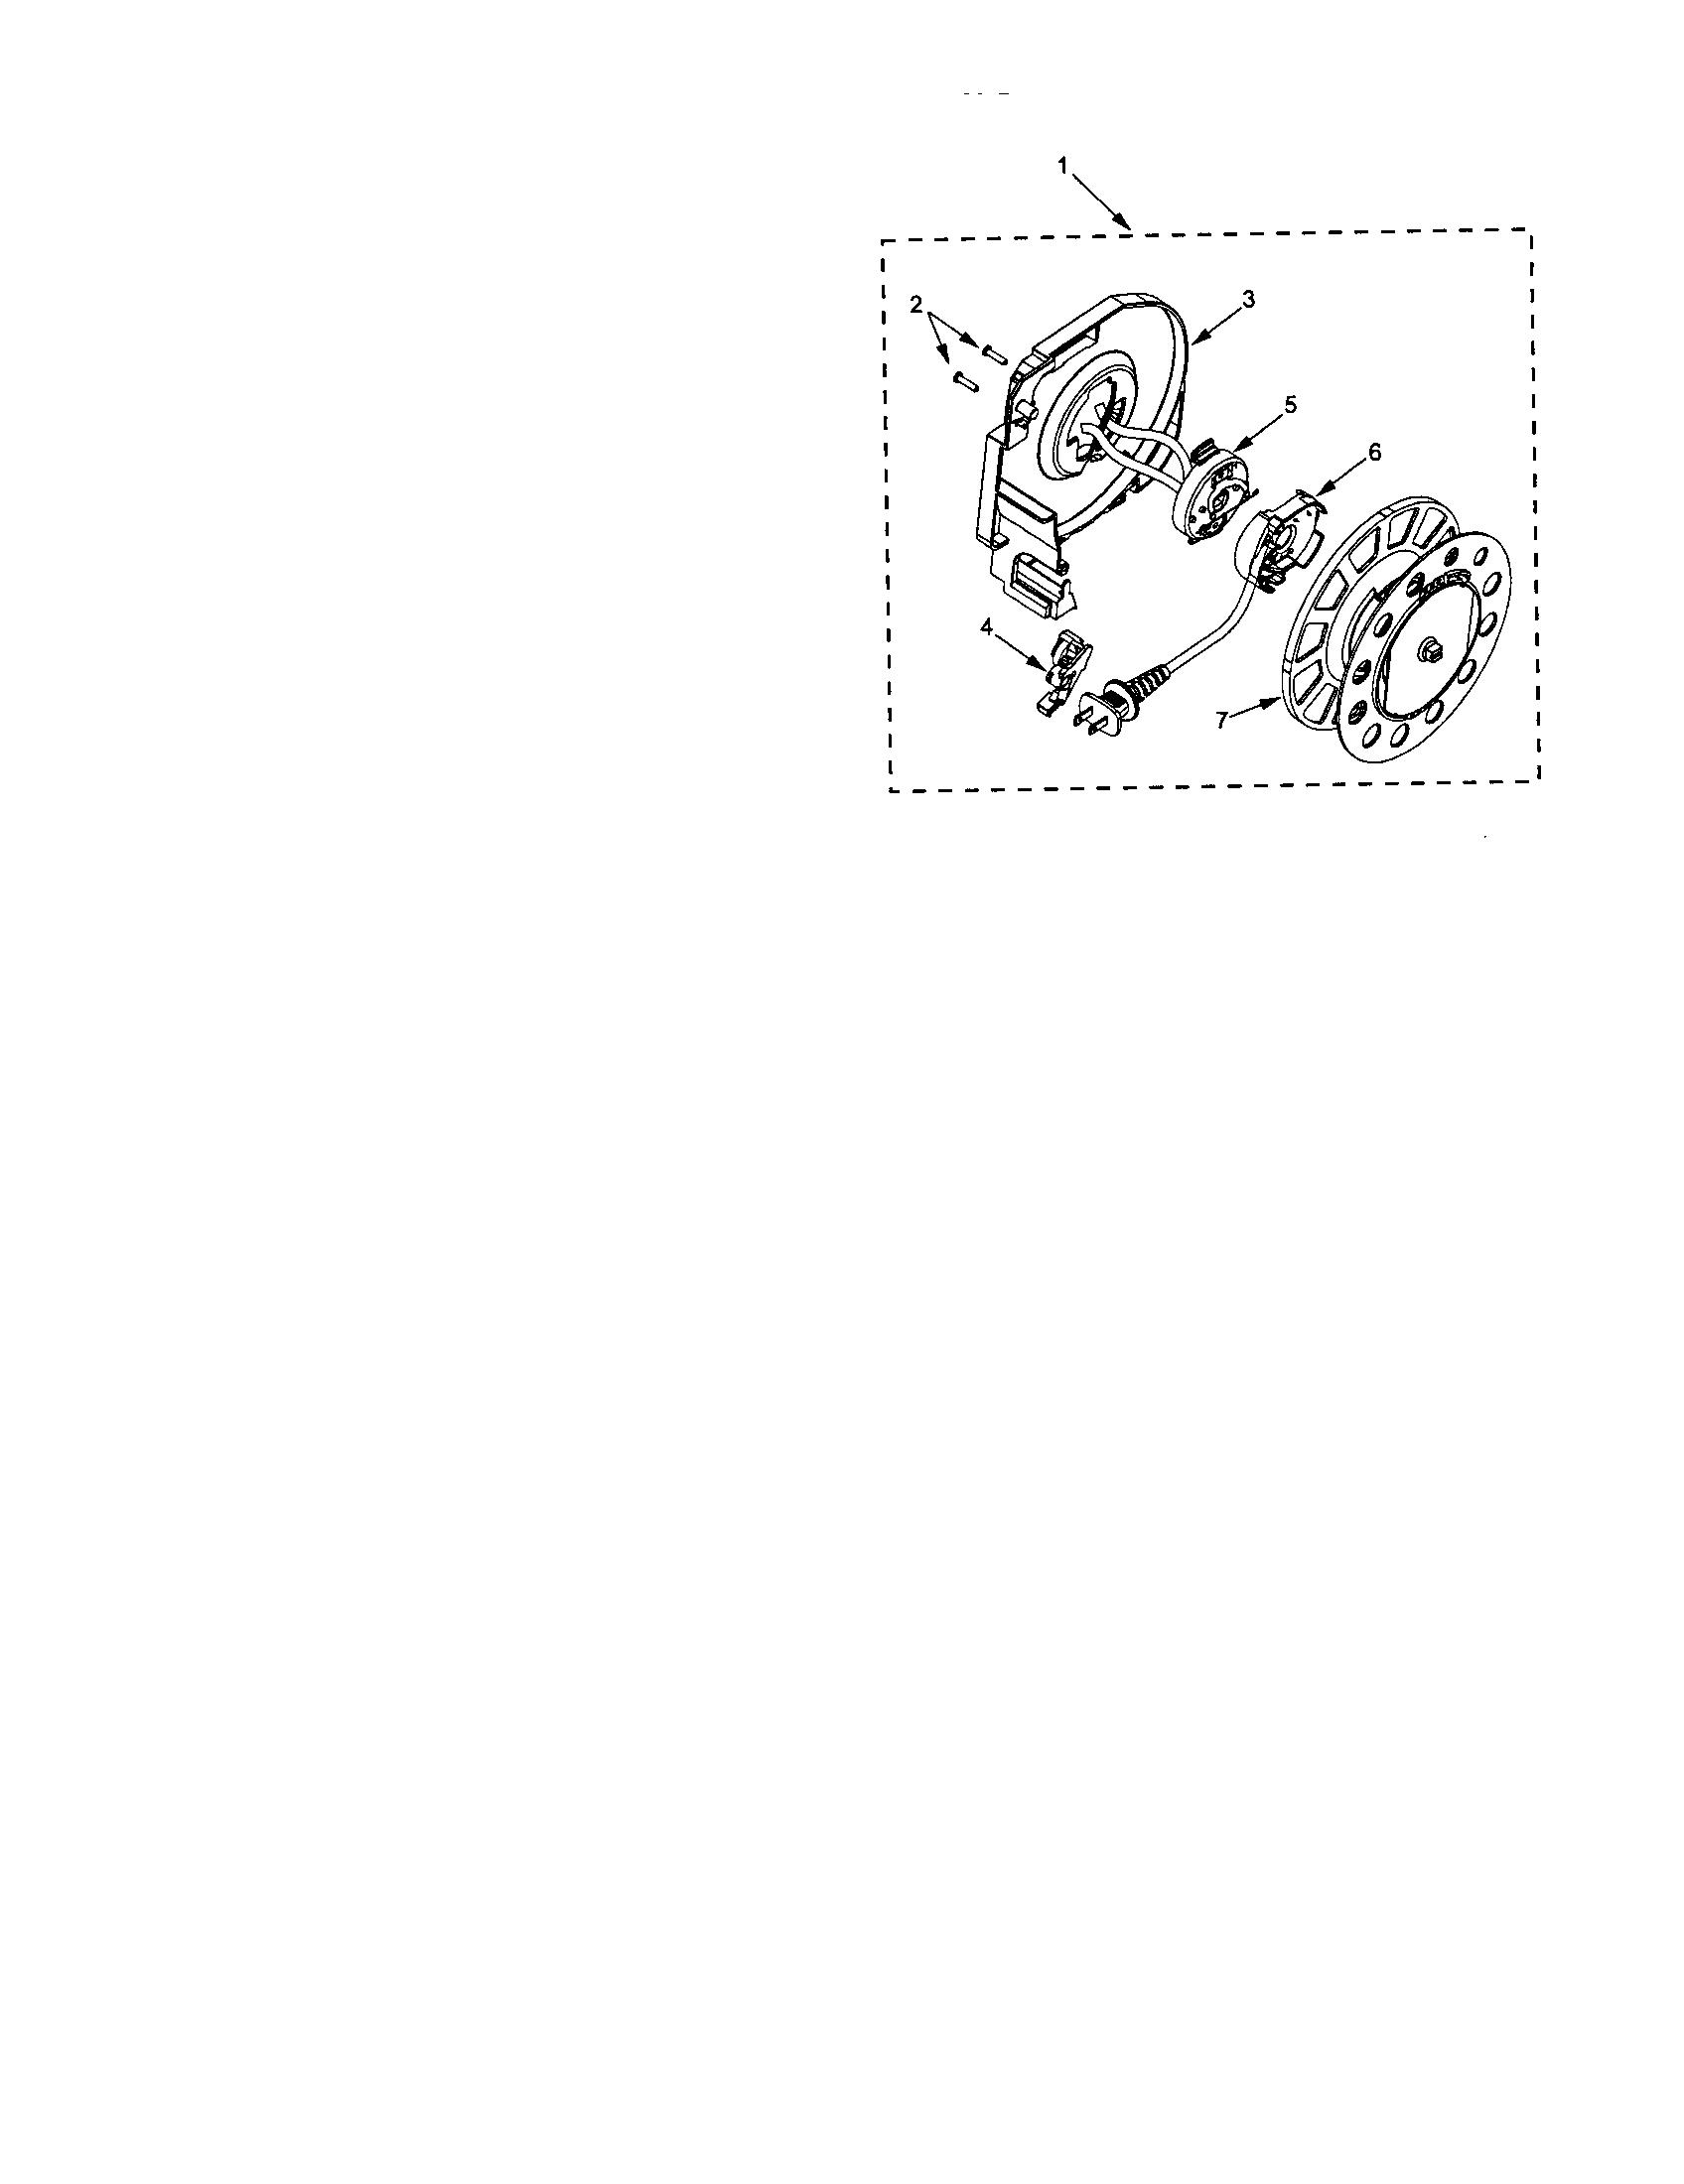 Kenmore Vacuum 116 35922500 Wiring Schematic : 44 Wiring